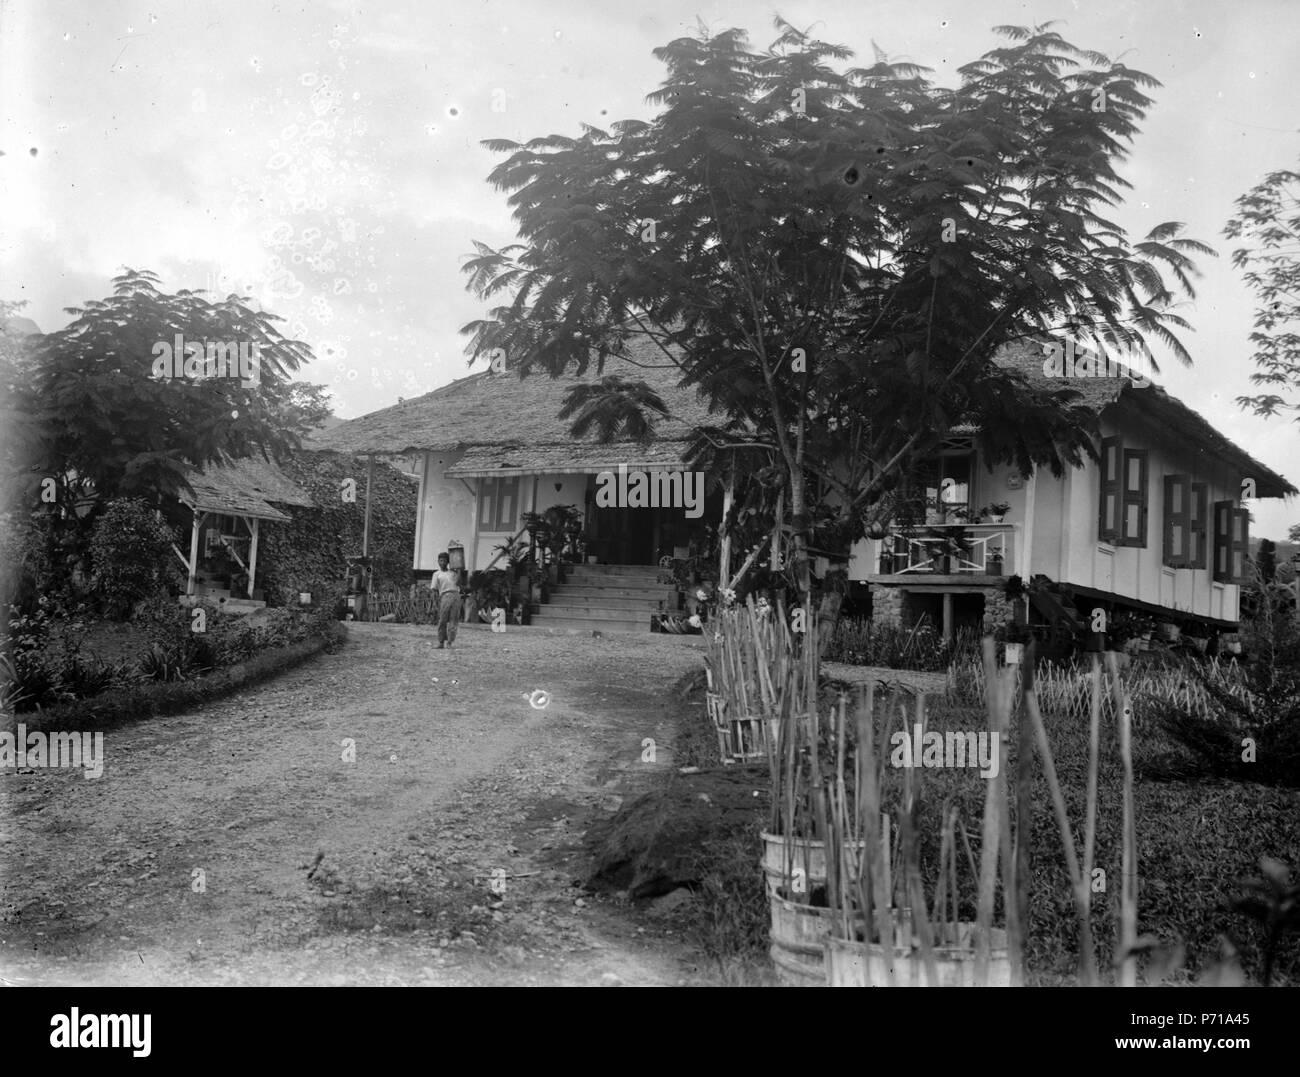 52 Soumans hus. Sulawesi. Indonesien - SMVK - 022113 - Stock Image